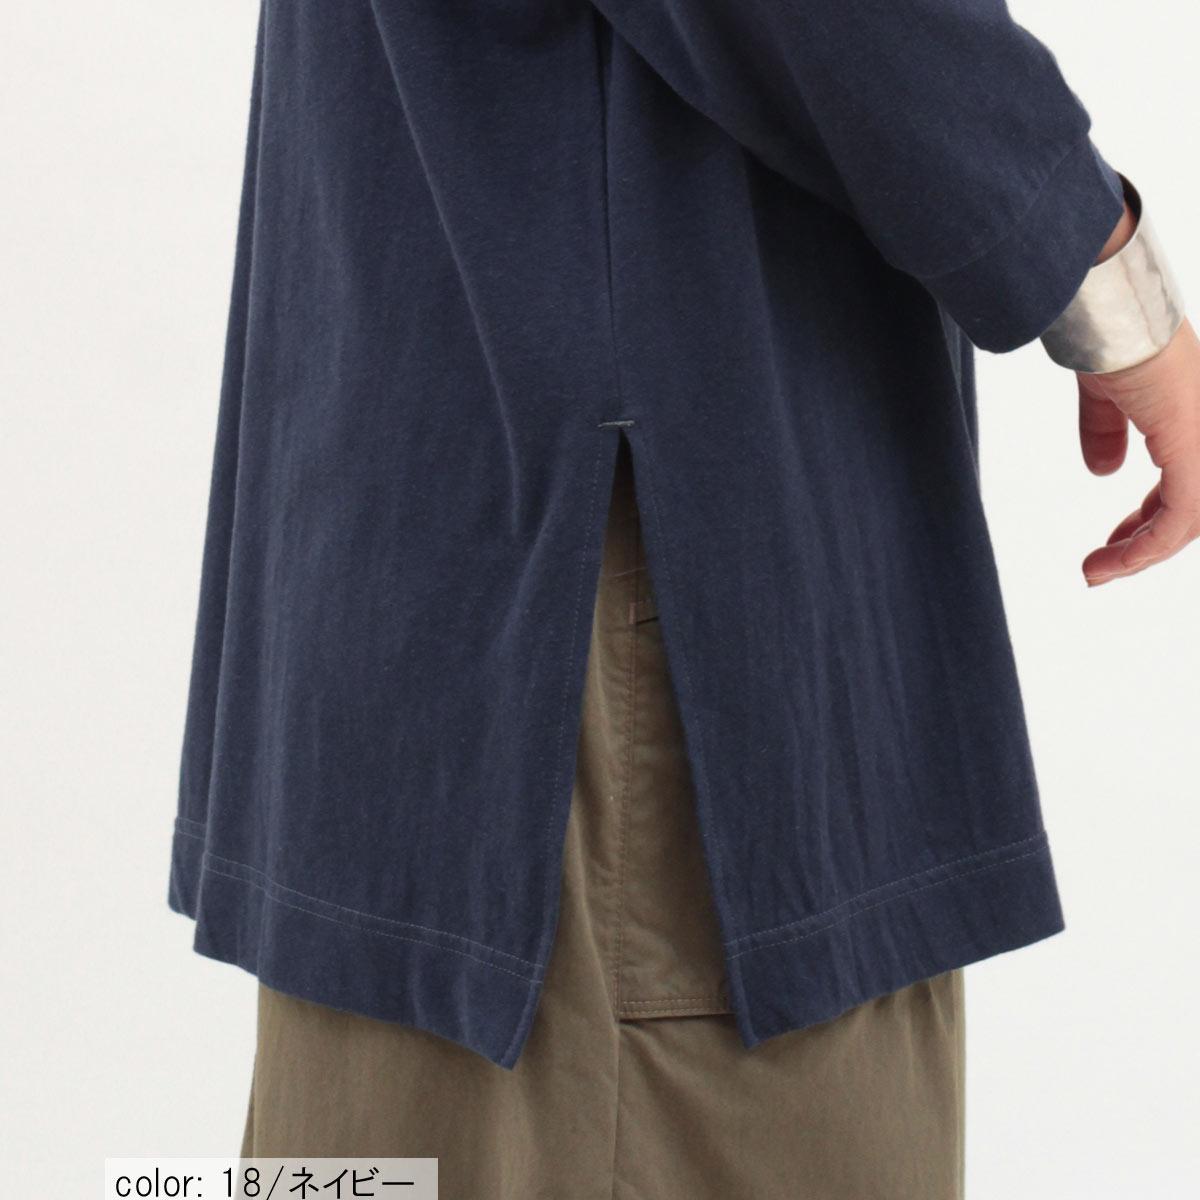 【2BUY15%OFF】リネン混8分袖ルーズプルオーバー CF6034